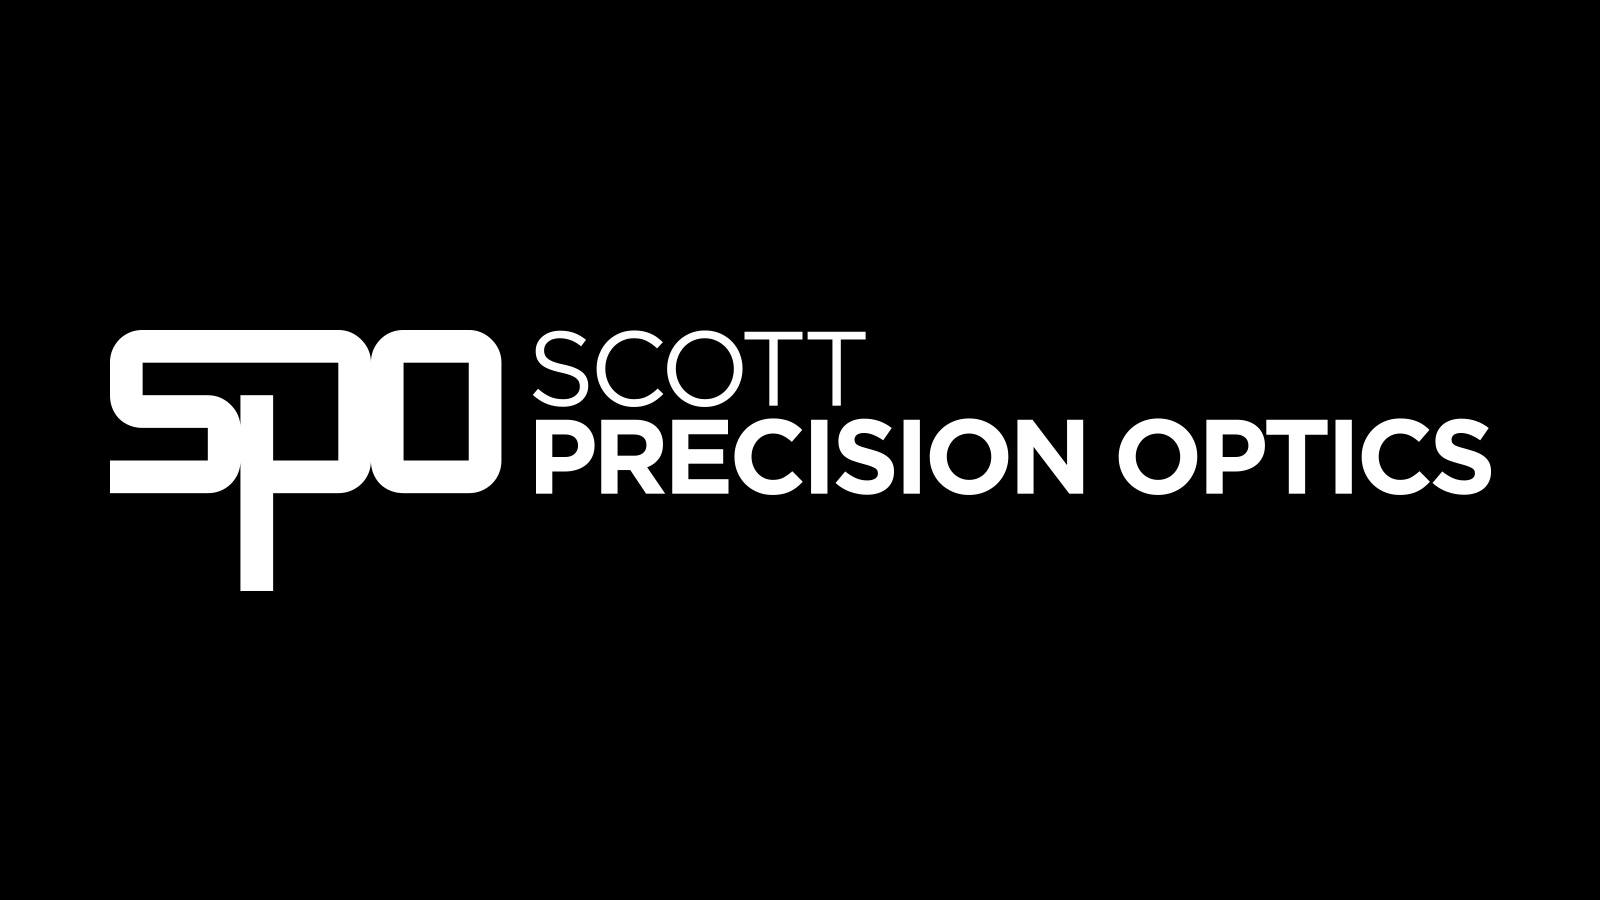 SCOTT Precision Optics - logo